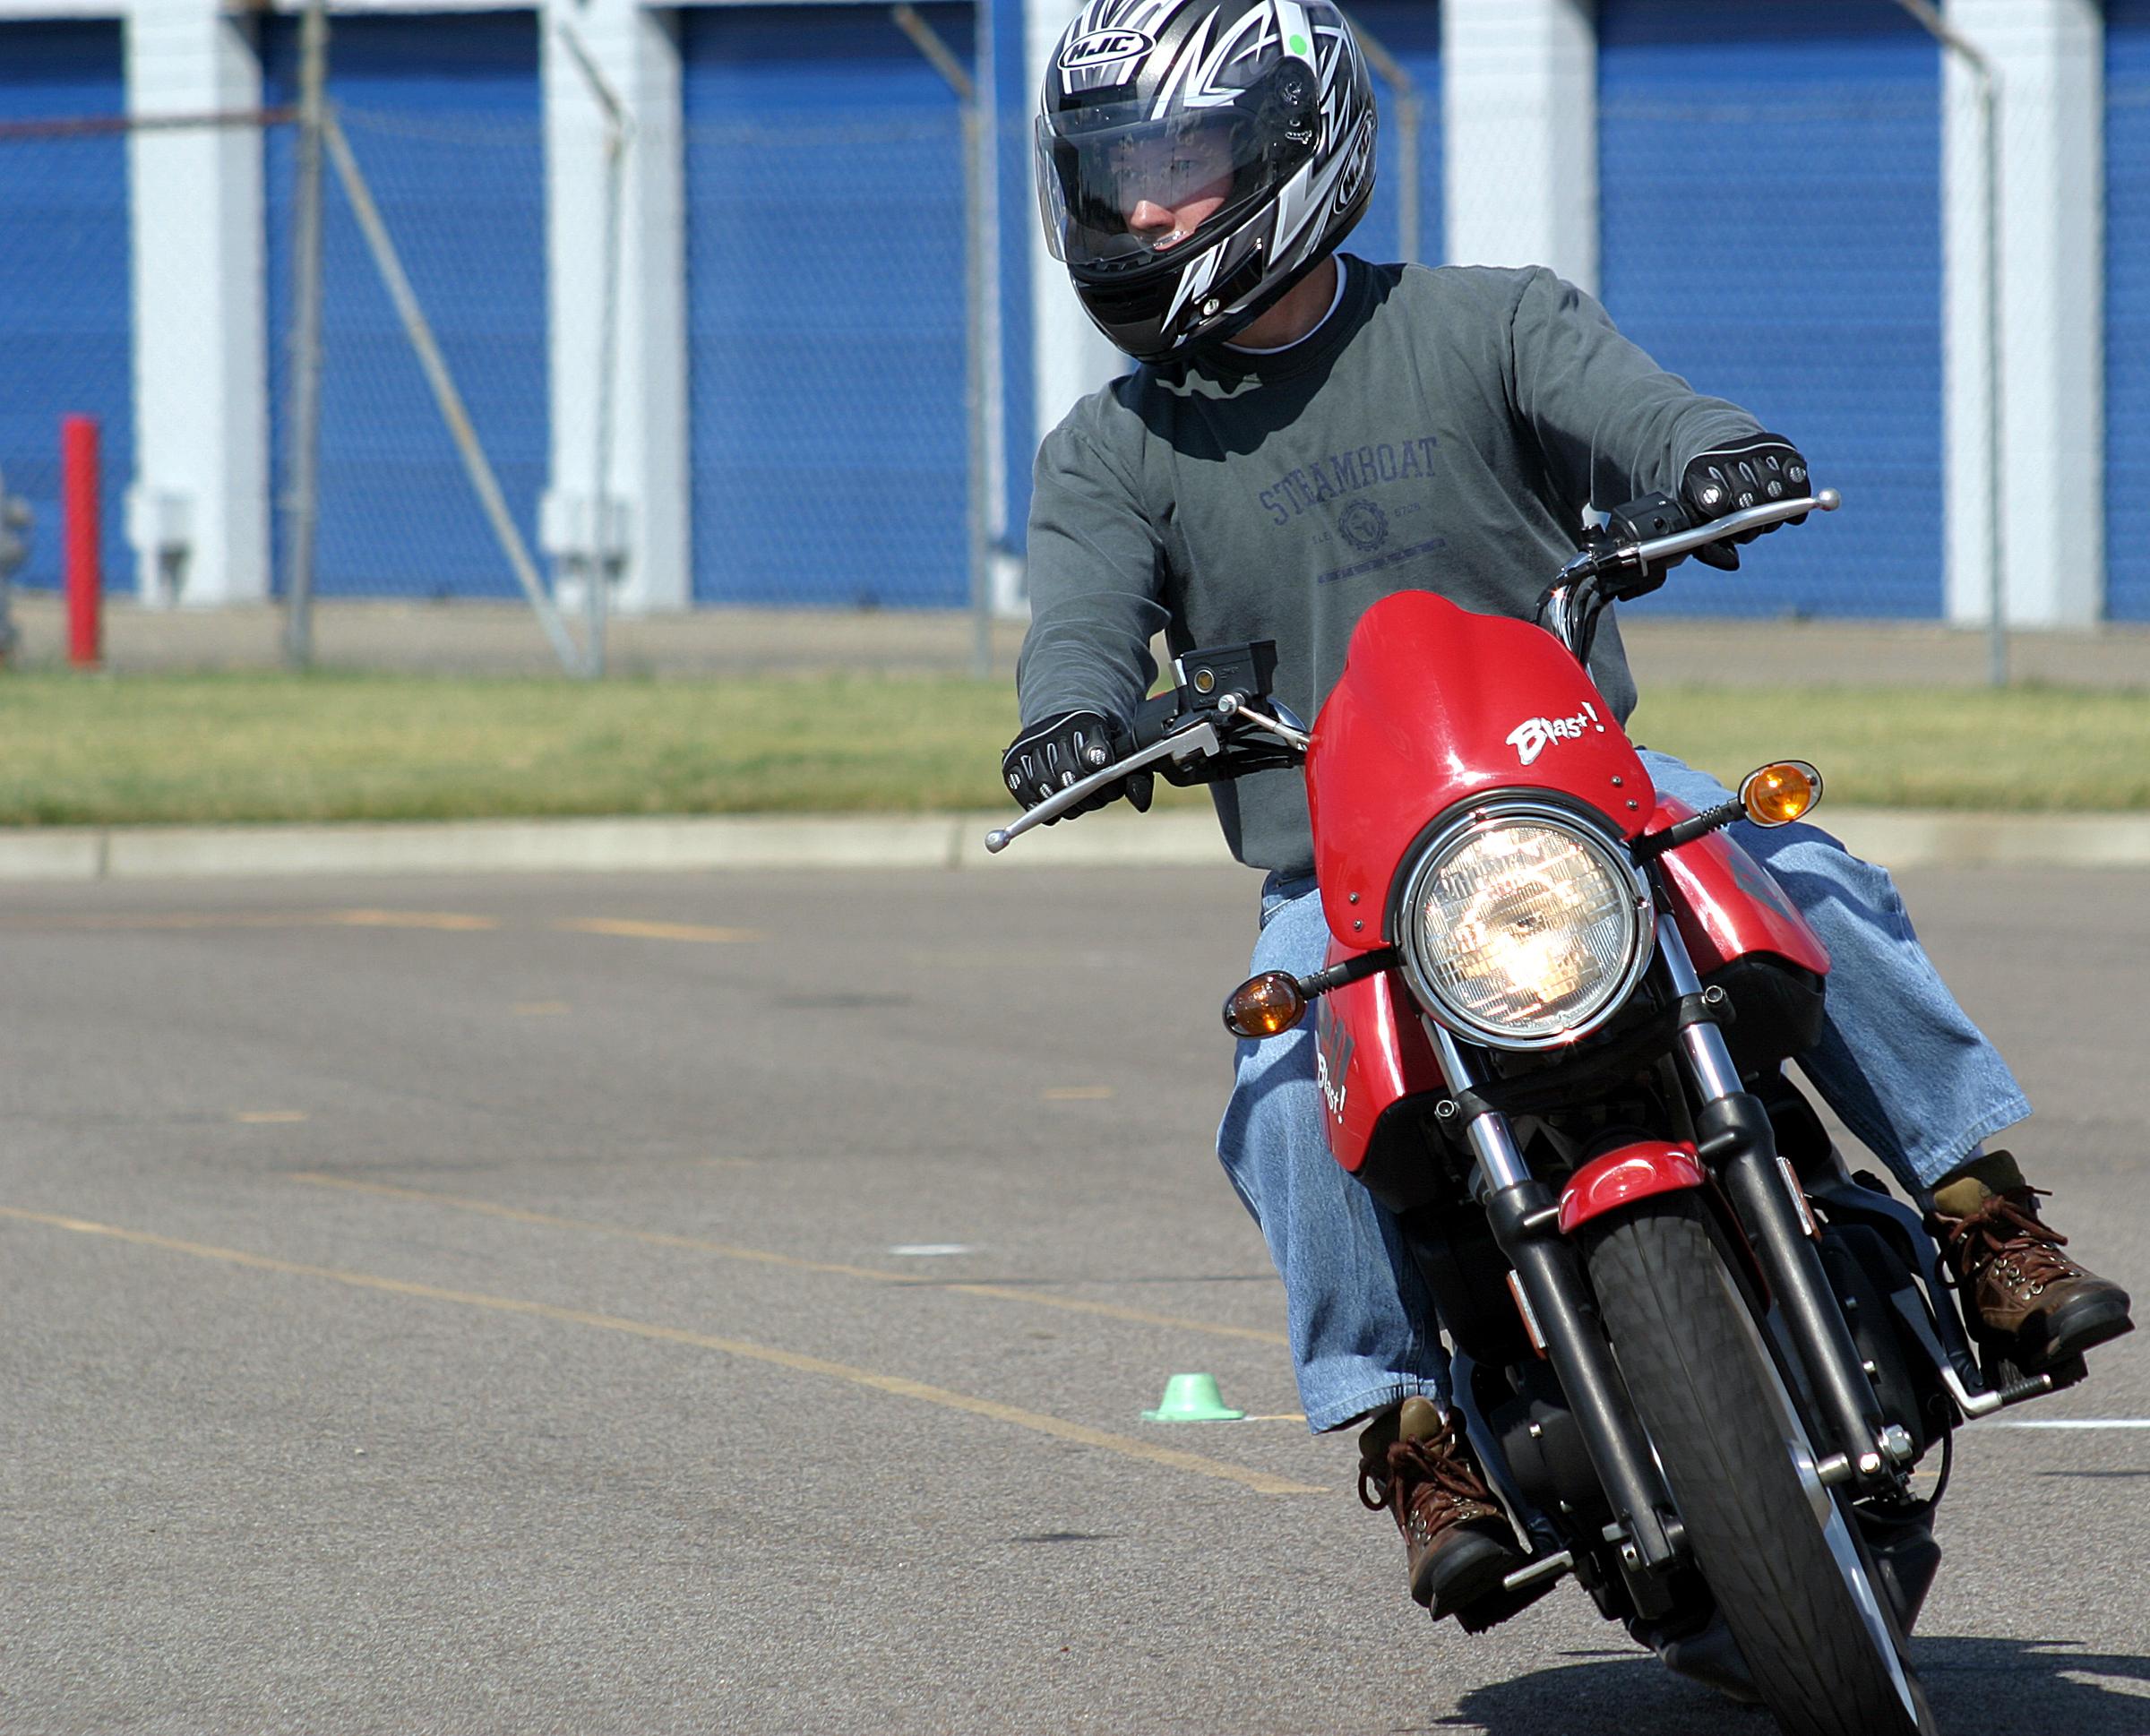 2004 Harley-Davidson Riding School